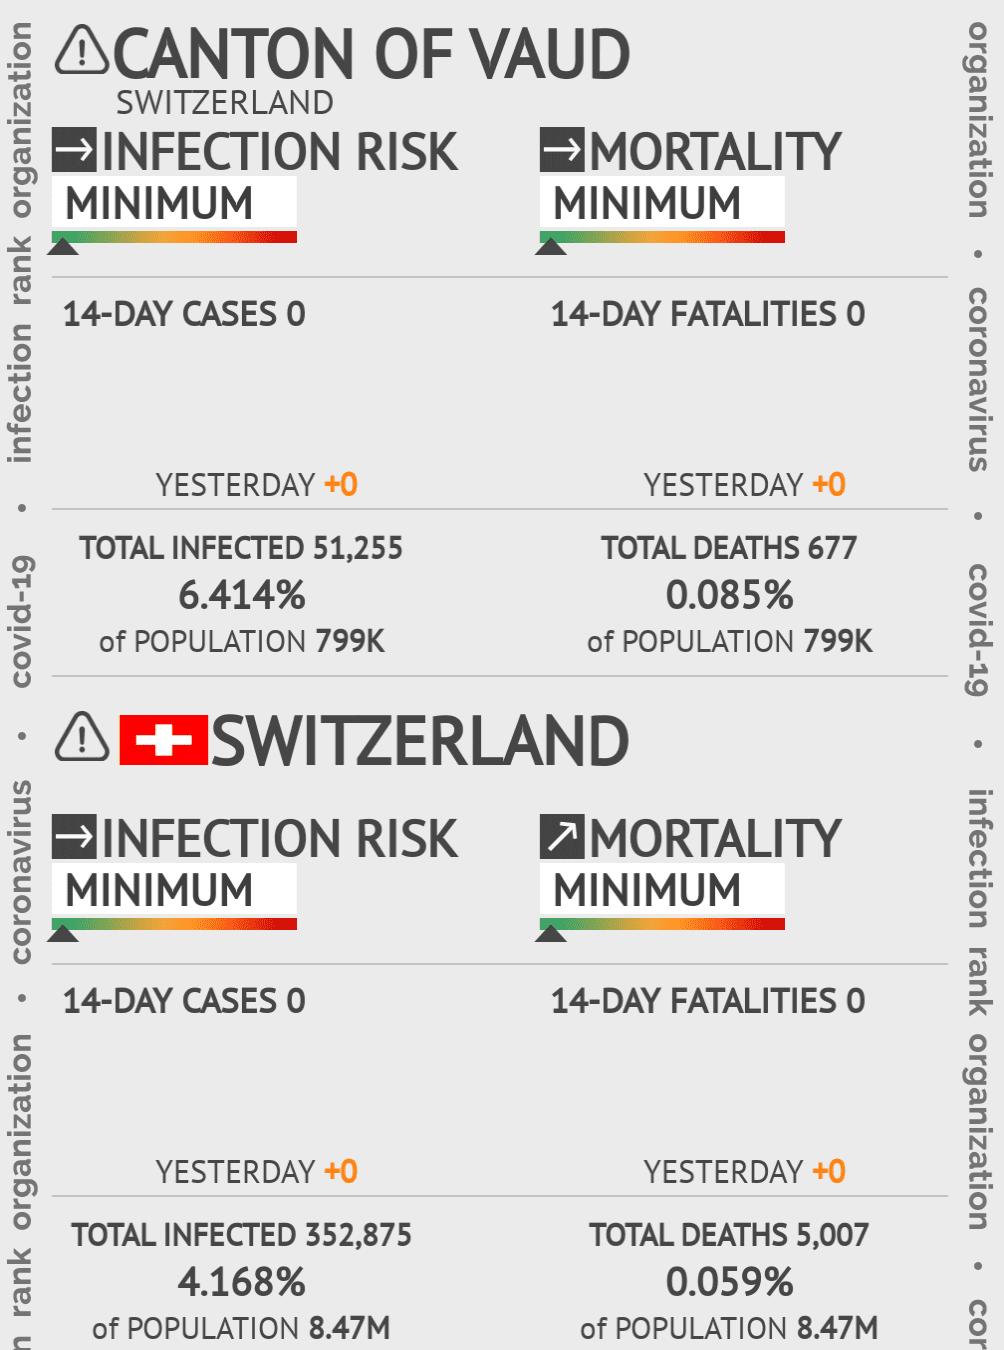 Vaud Coronavirus Covid-19 Risk of Infection on February 27, 2021